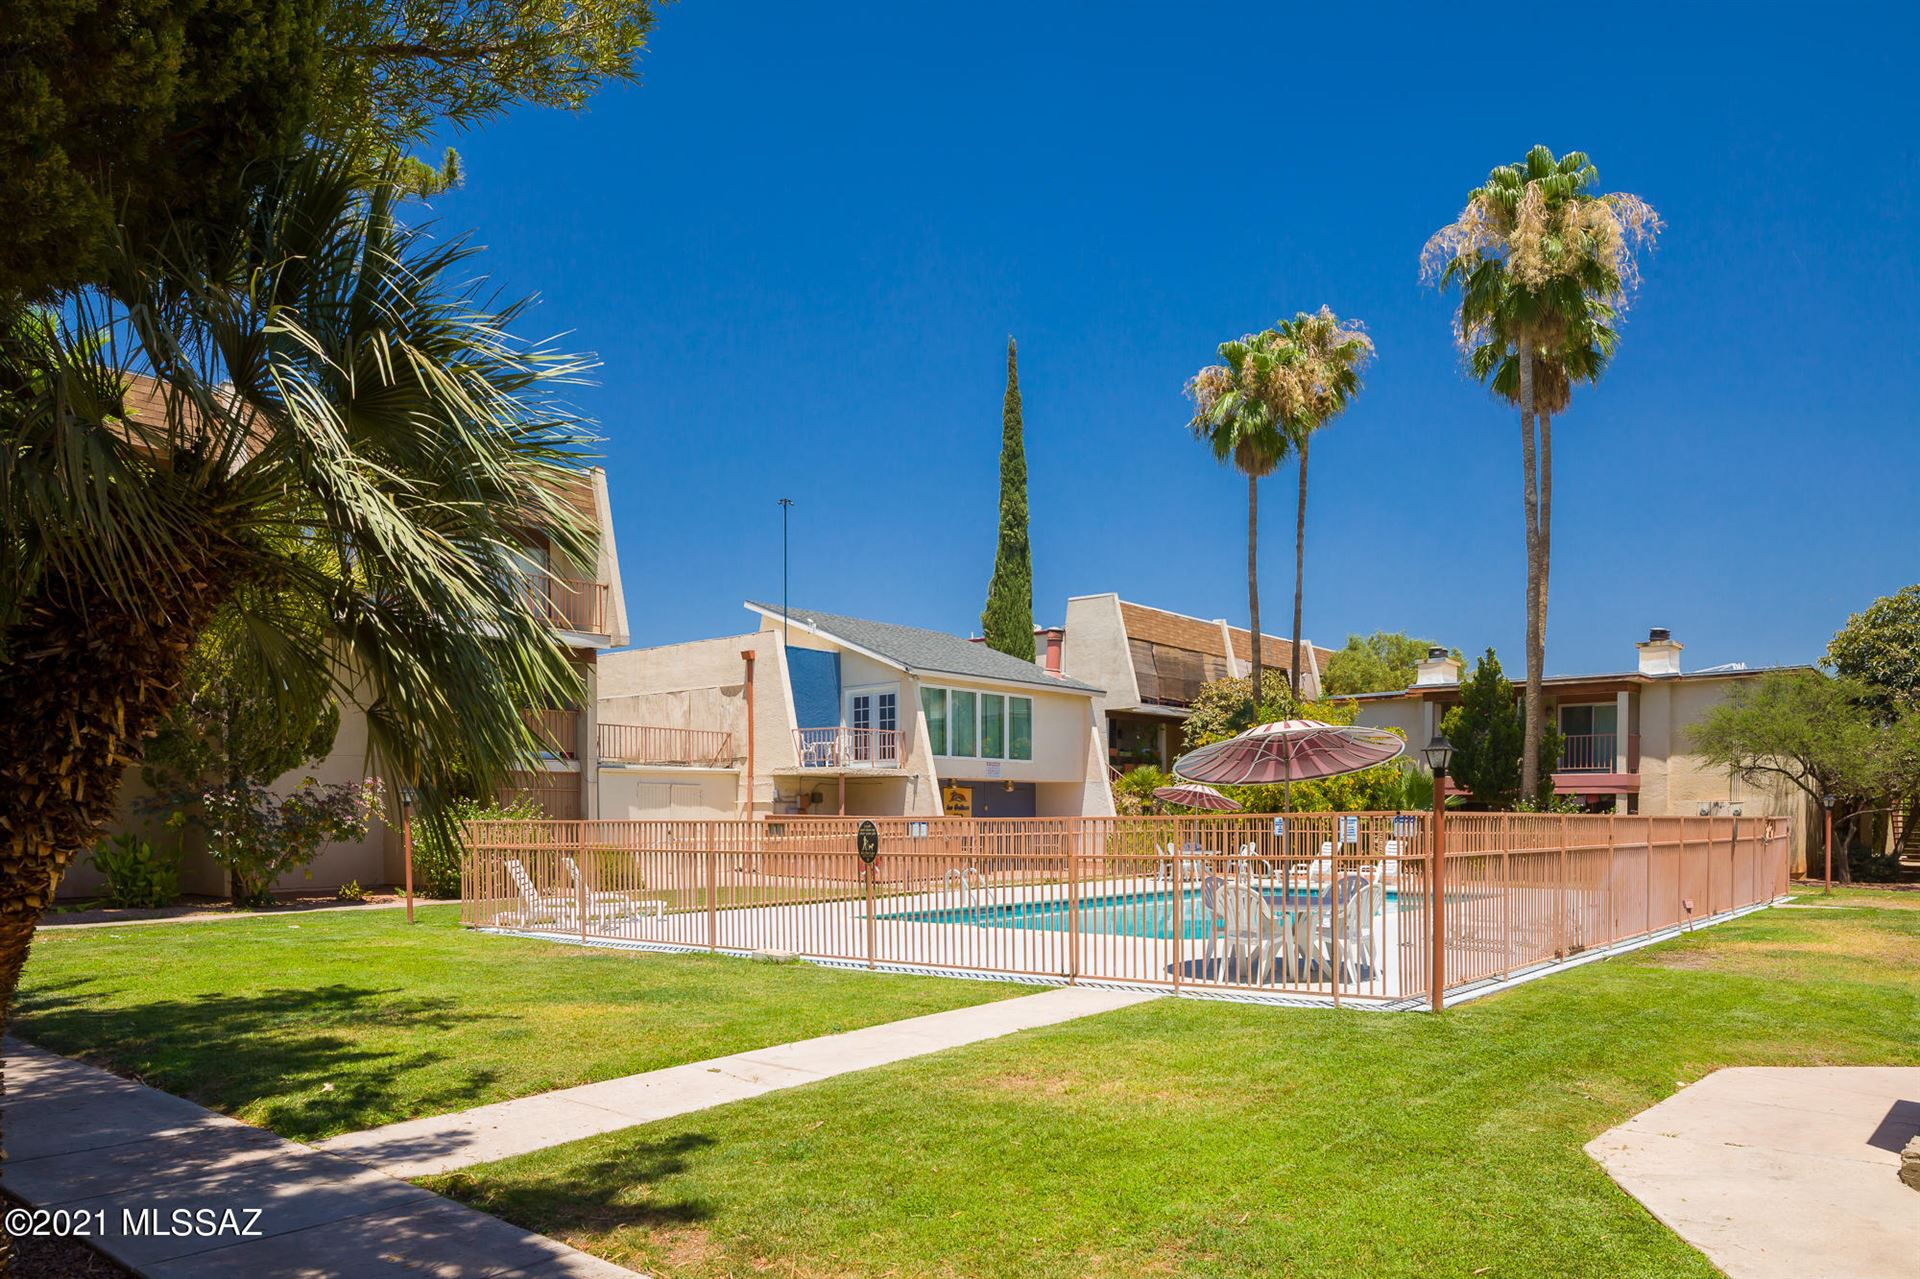 1600 N Wilmot Road #160, Tucson, AZ 85712 - MLS#: 22112549